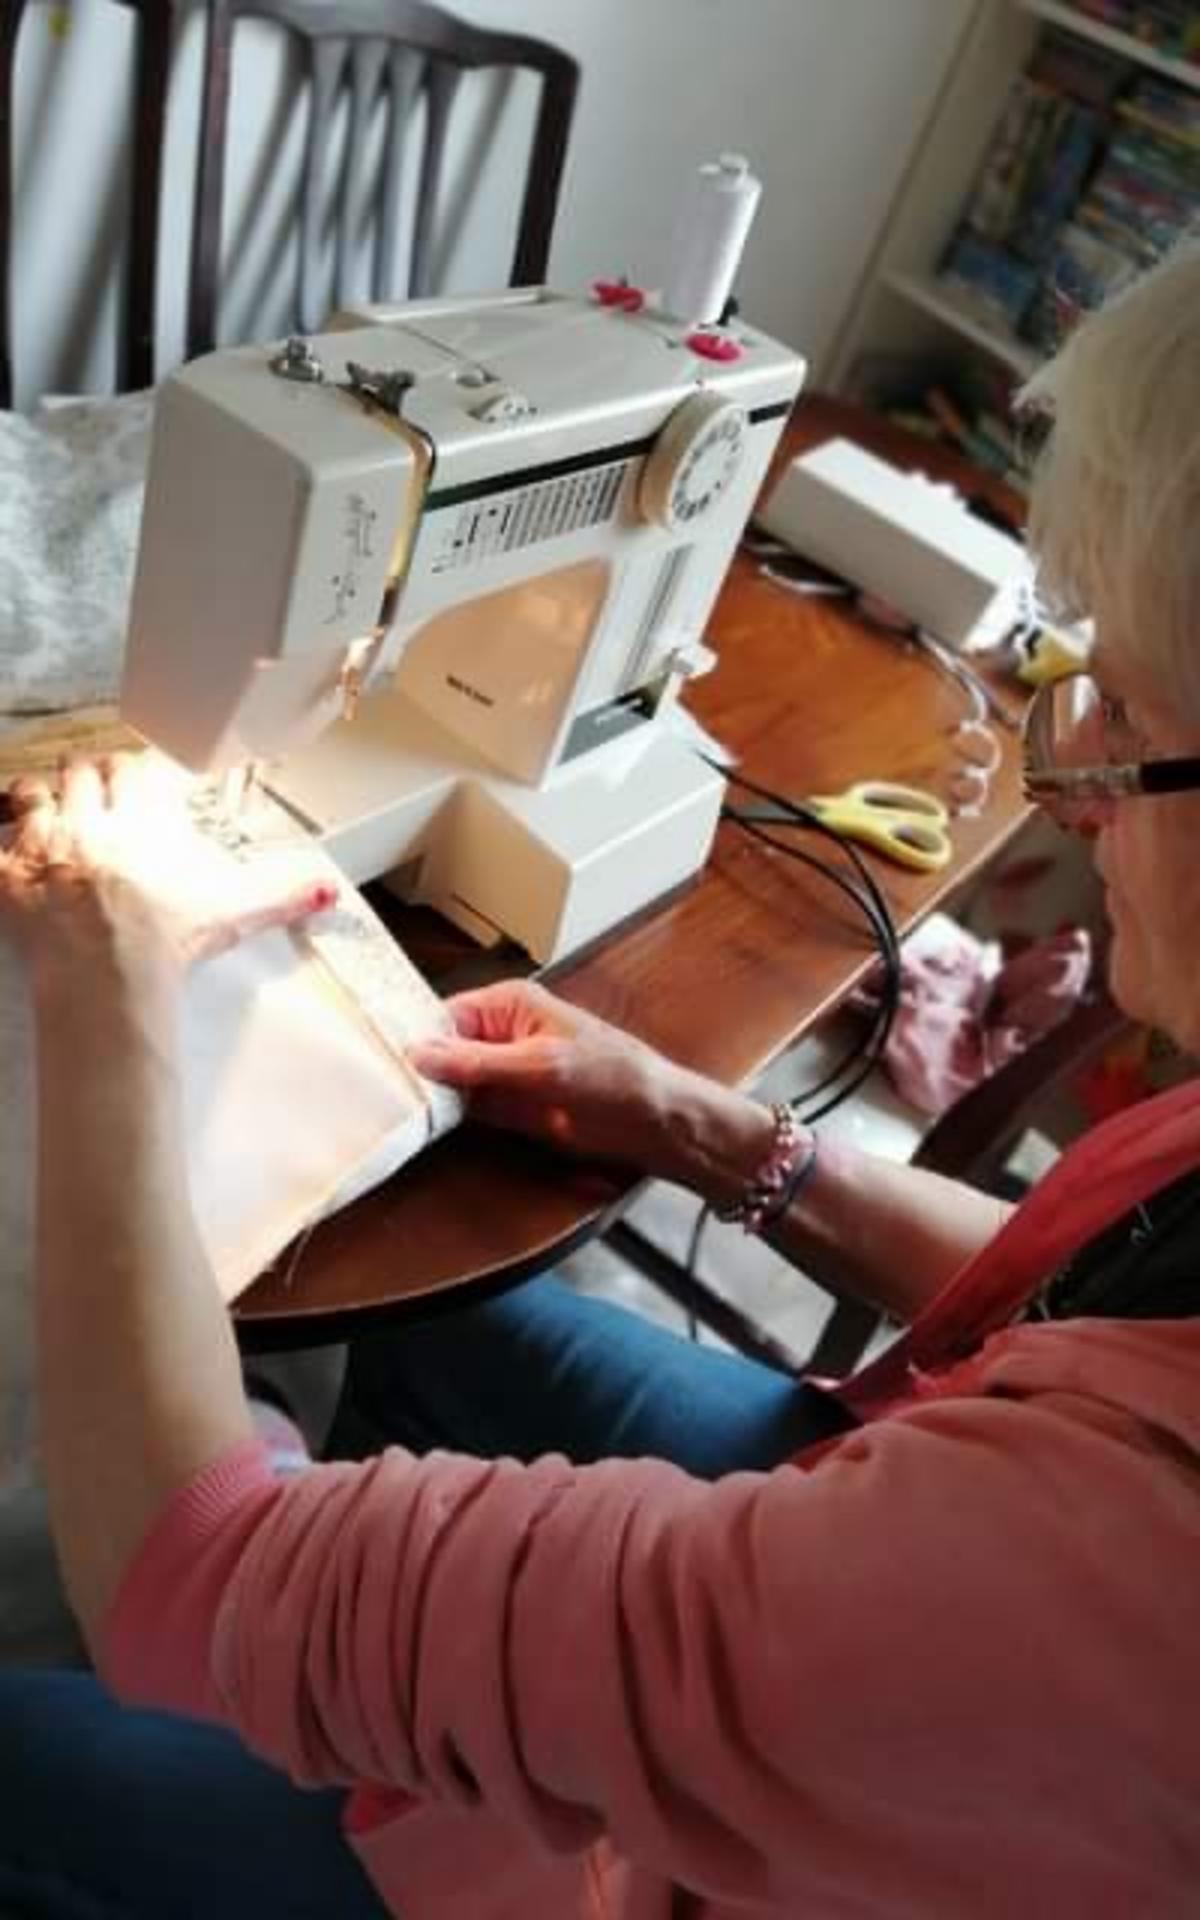 Jo Redworth sewing on sewing machine